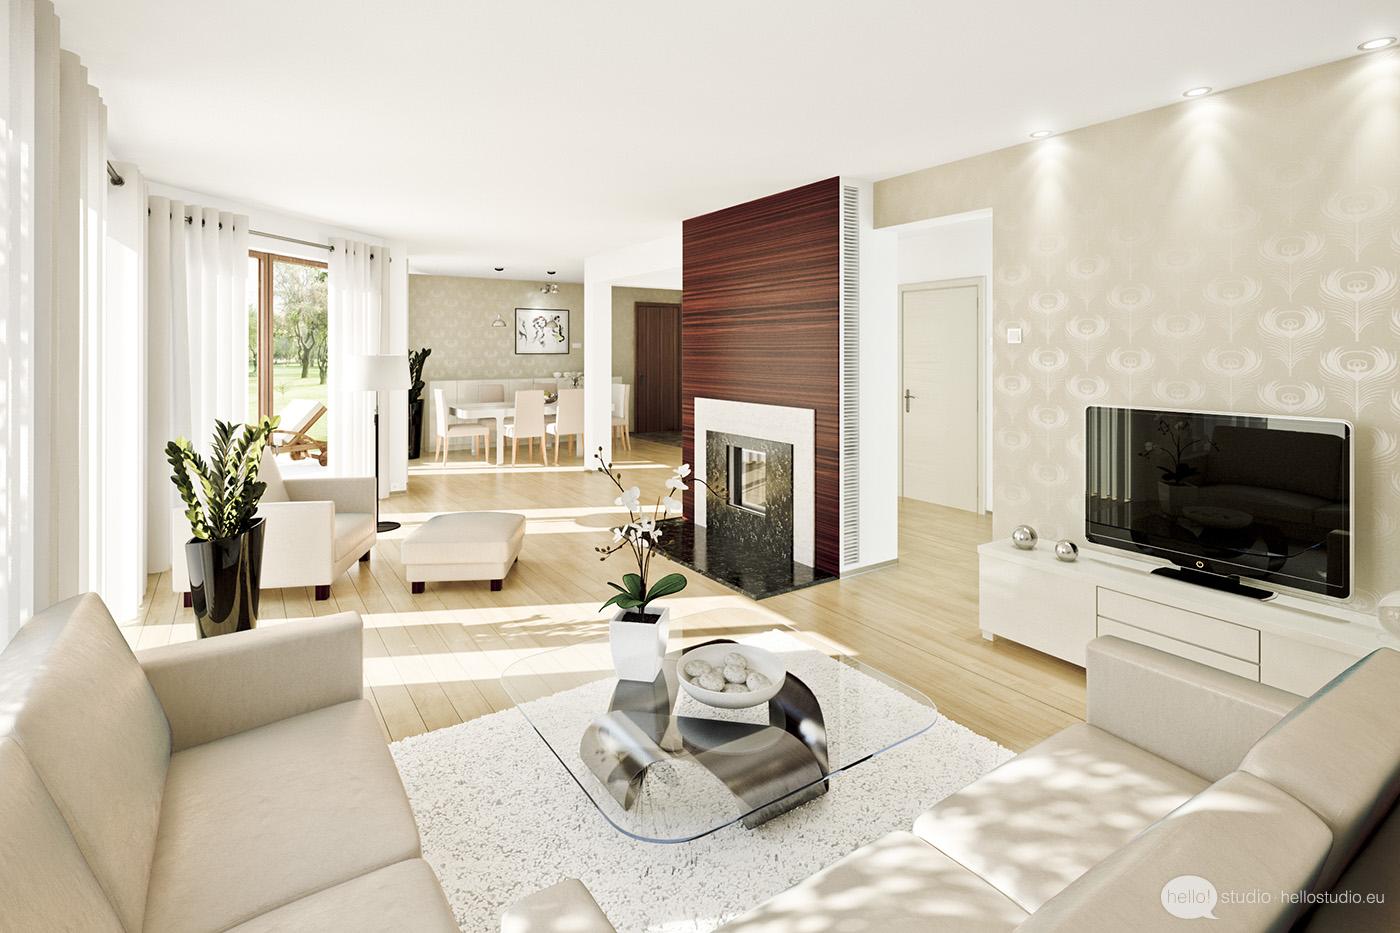 Home Interior Design,Ideas And Tips Blog